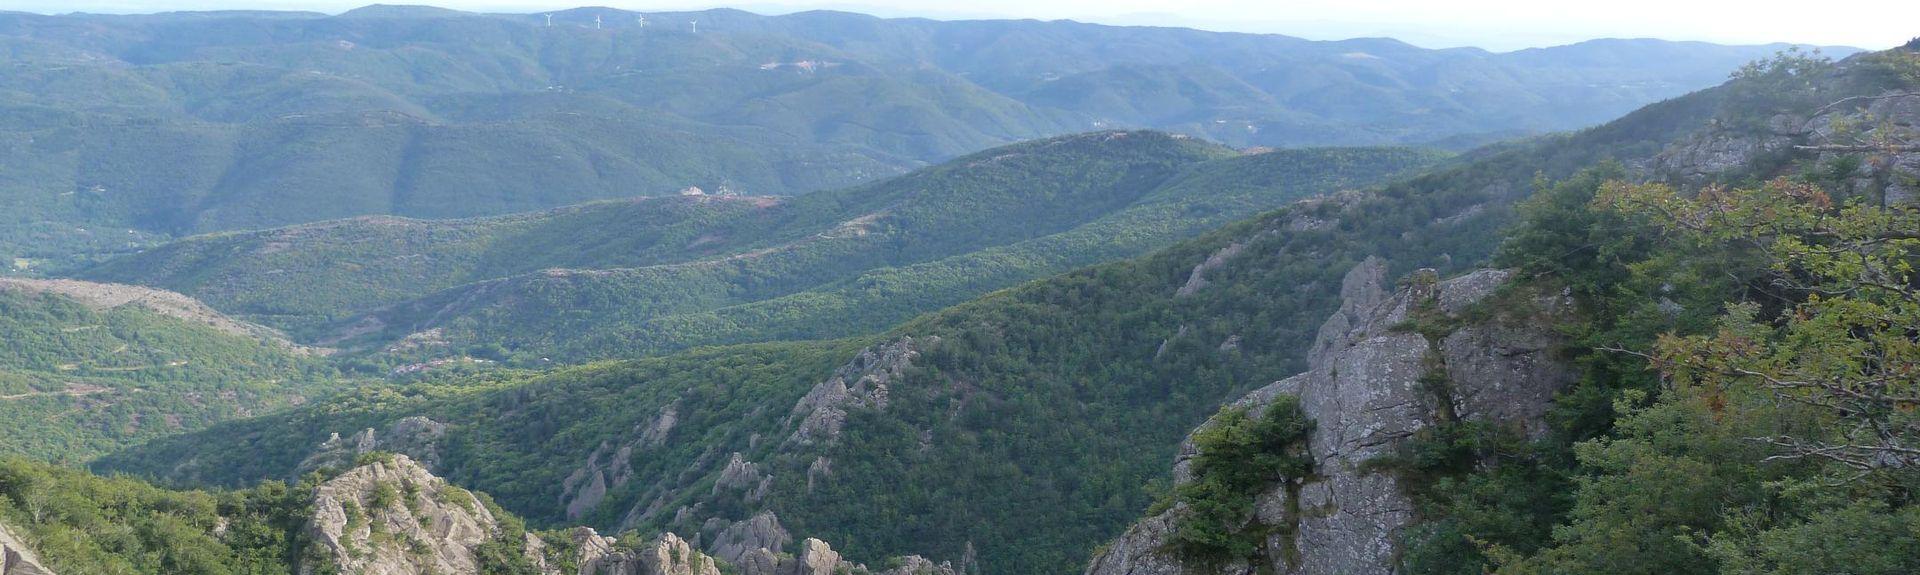 Ferrals-les-Montagnes, France